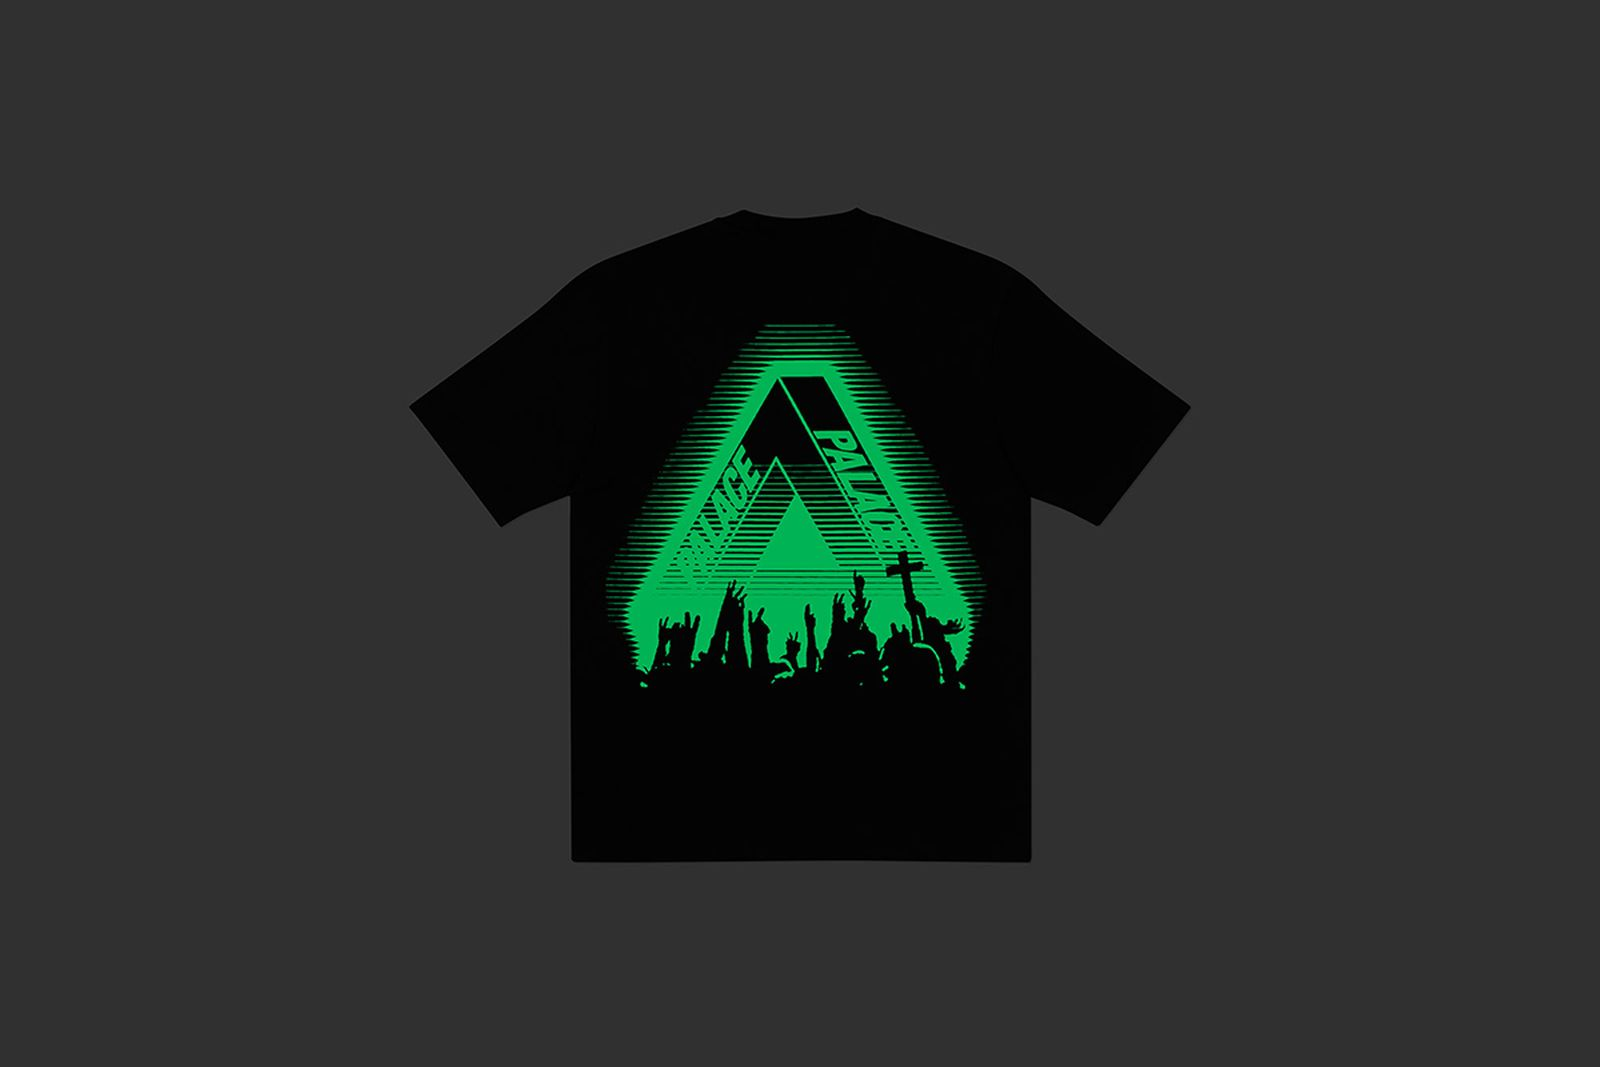 Palace Tri-Ferg T-Shirt Glow in the Dark